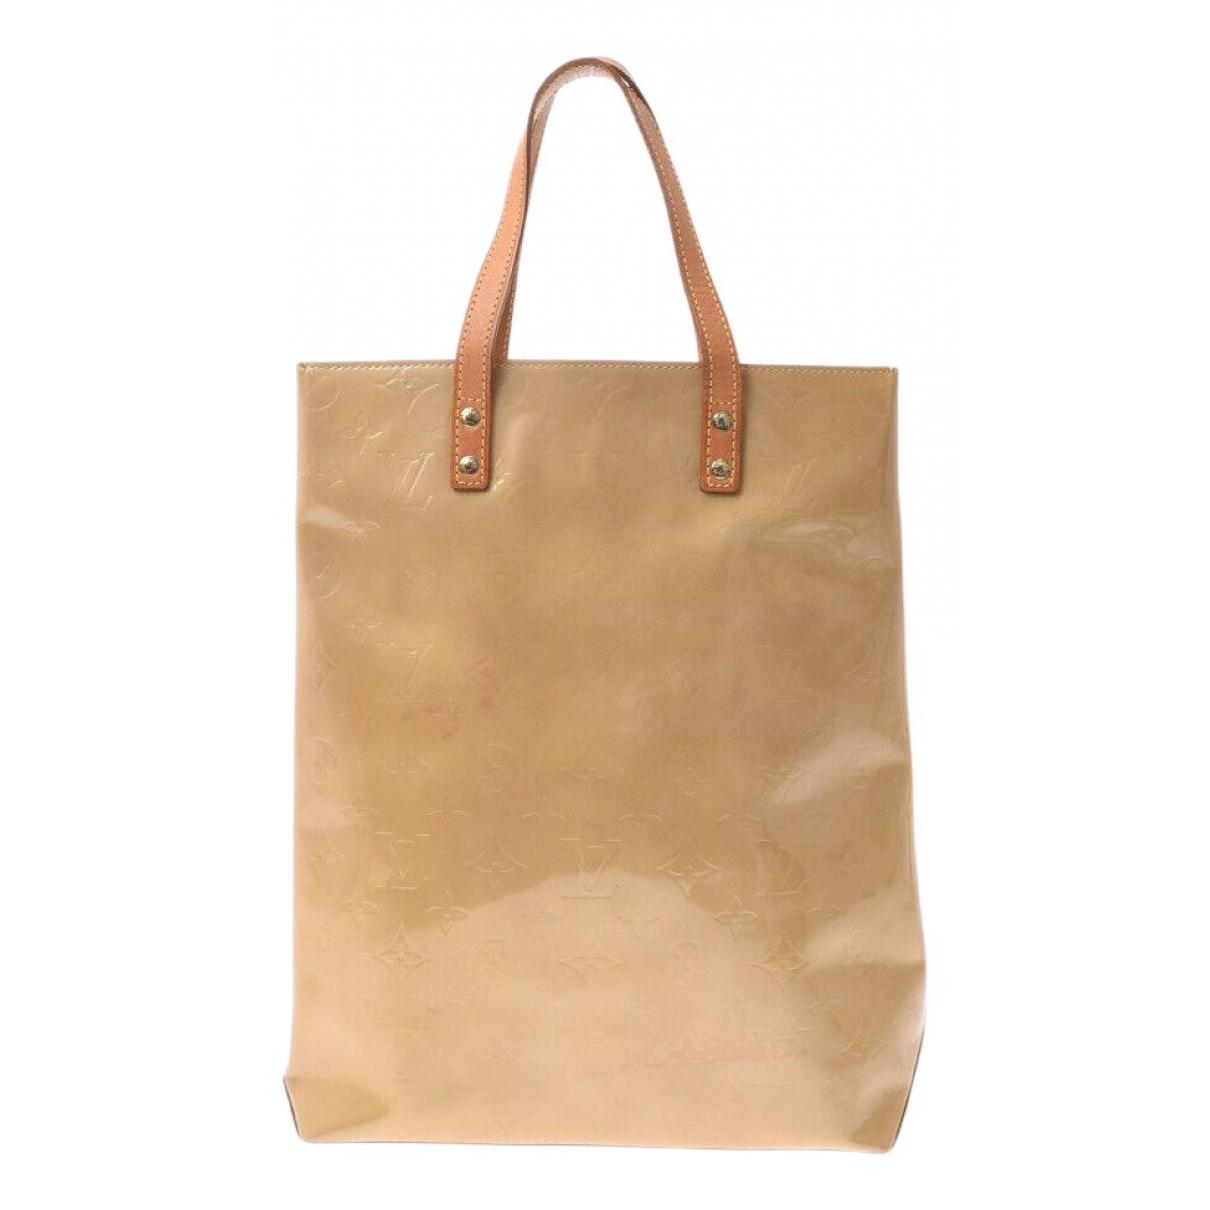 Louis Vuitton - Sac a main Reade pour femme en cuir verni - beige